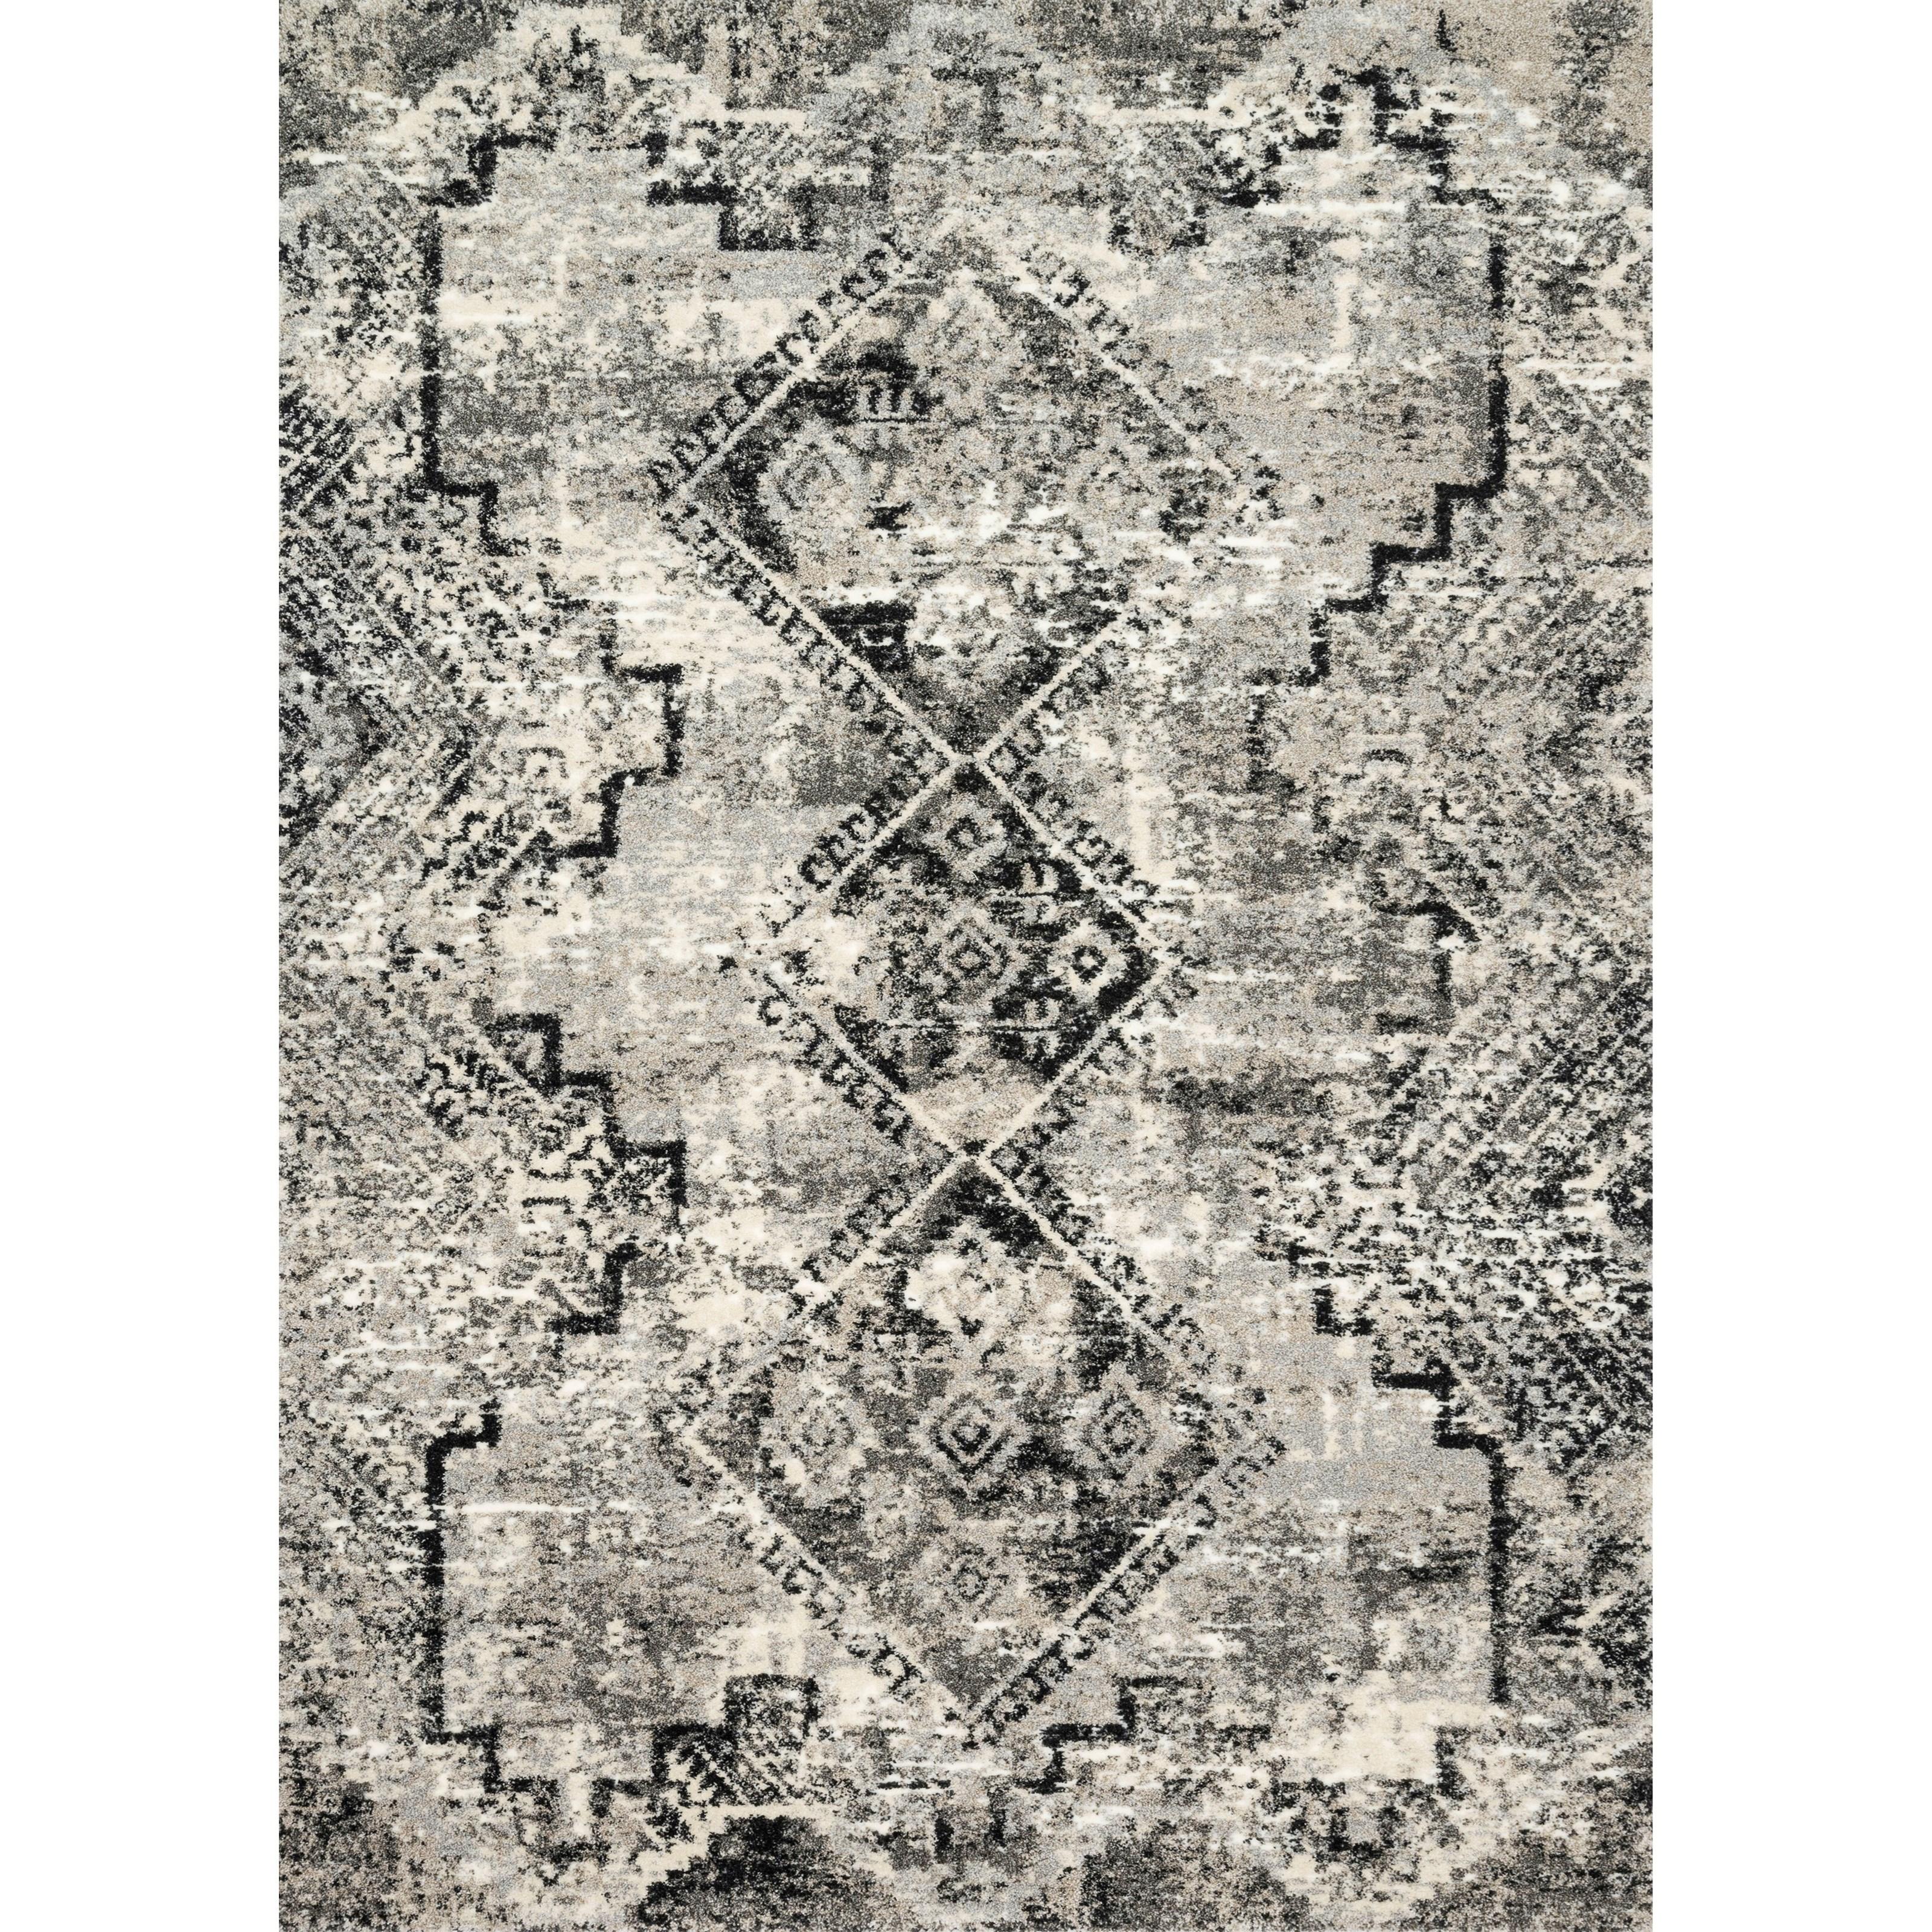 "Viera 1'6"" x 1'6""  Grey / Black Rug by Loloi Rugs at Belfort Furniture"